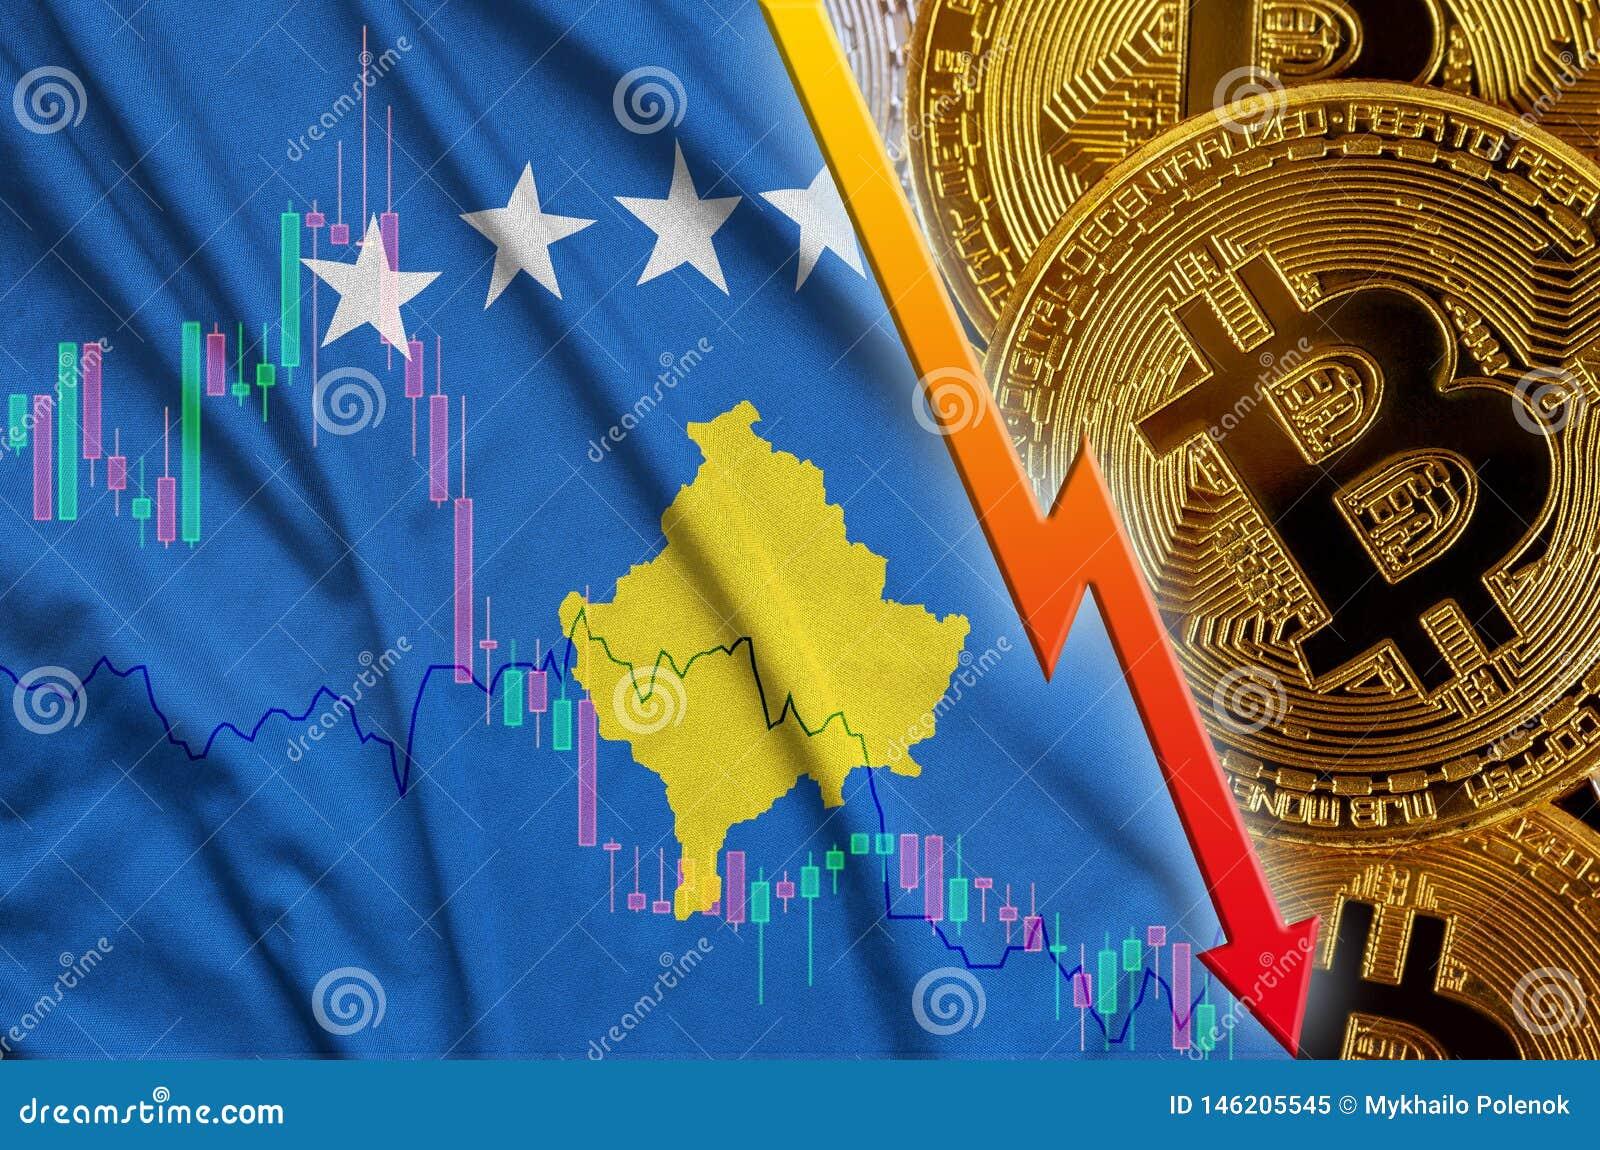 Kosovo mining bitcoins federer vs wawrinka bettingexpert football